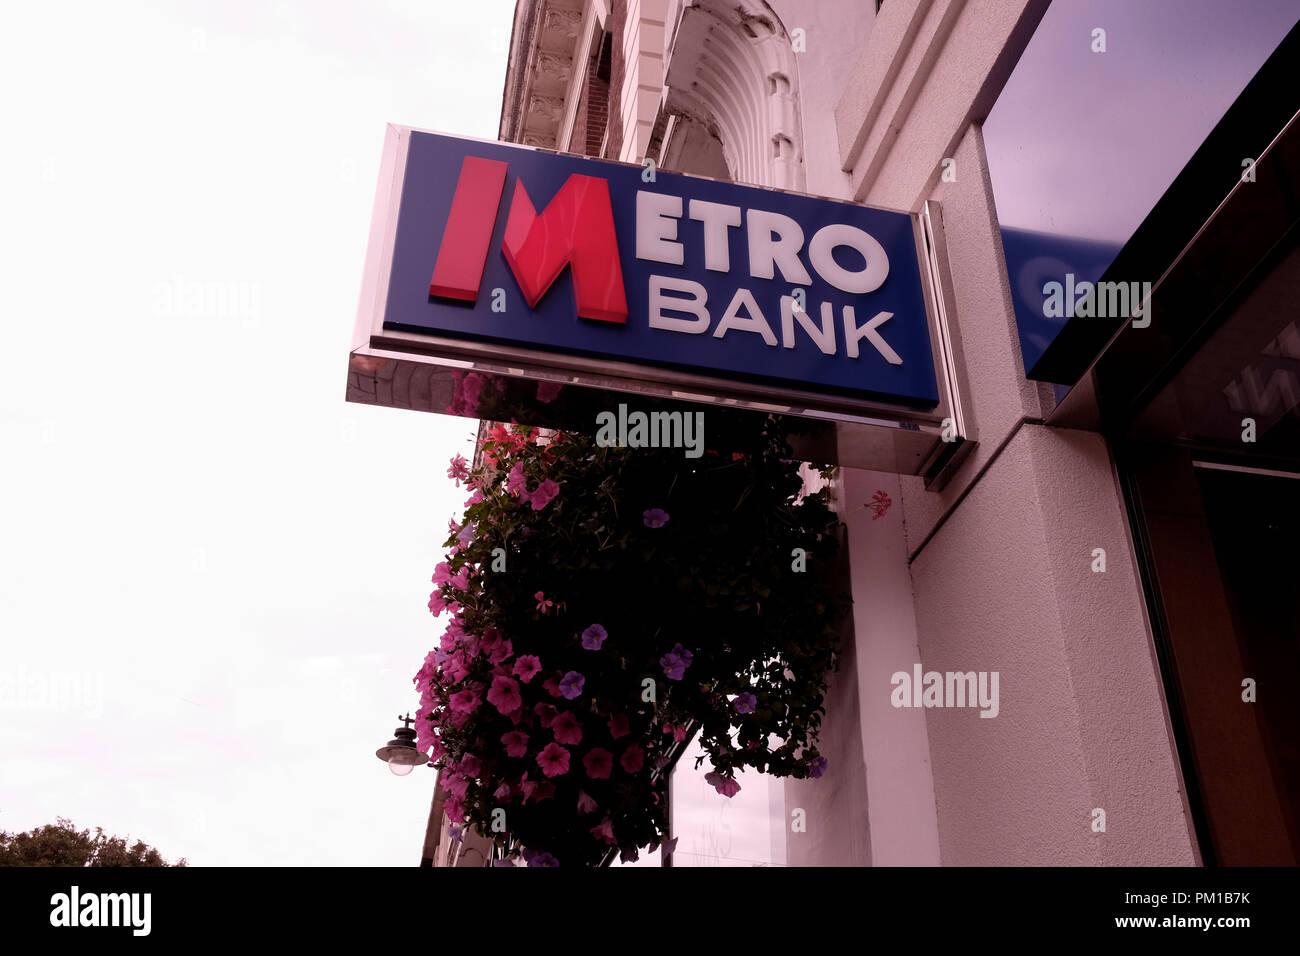 metro bank in the city of canterbury kent uk september 2018 - Stock Image